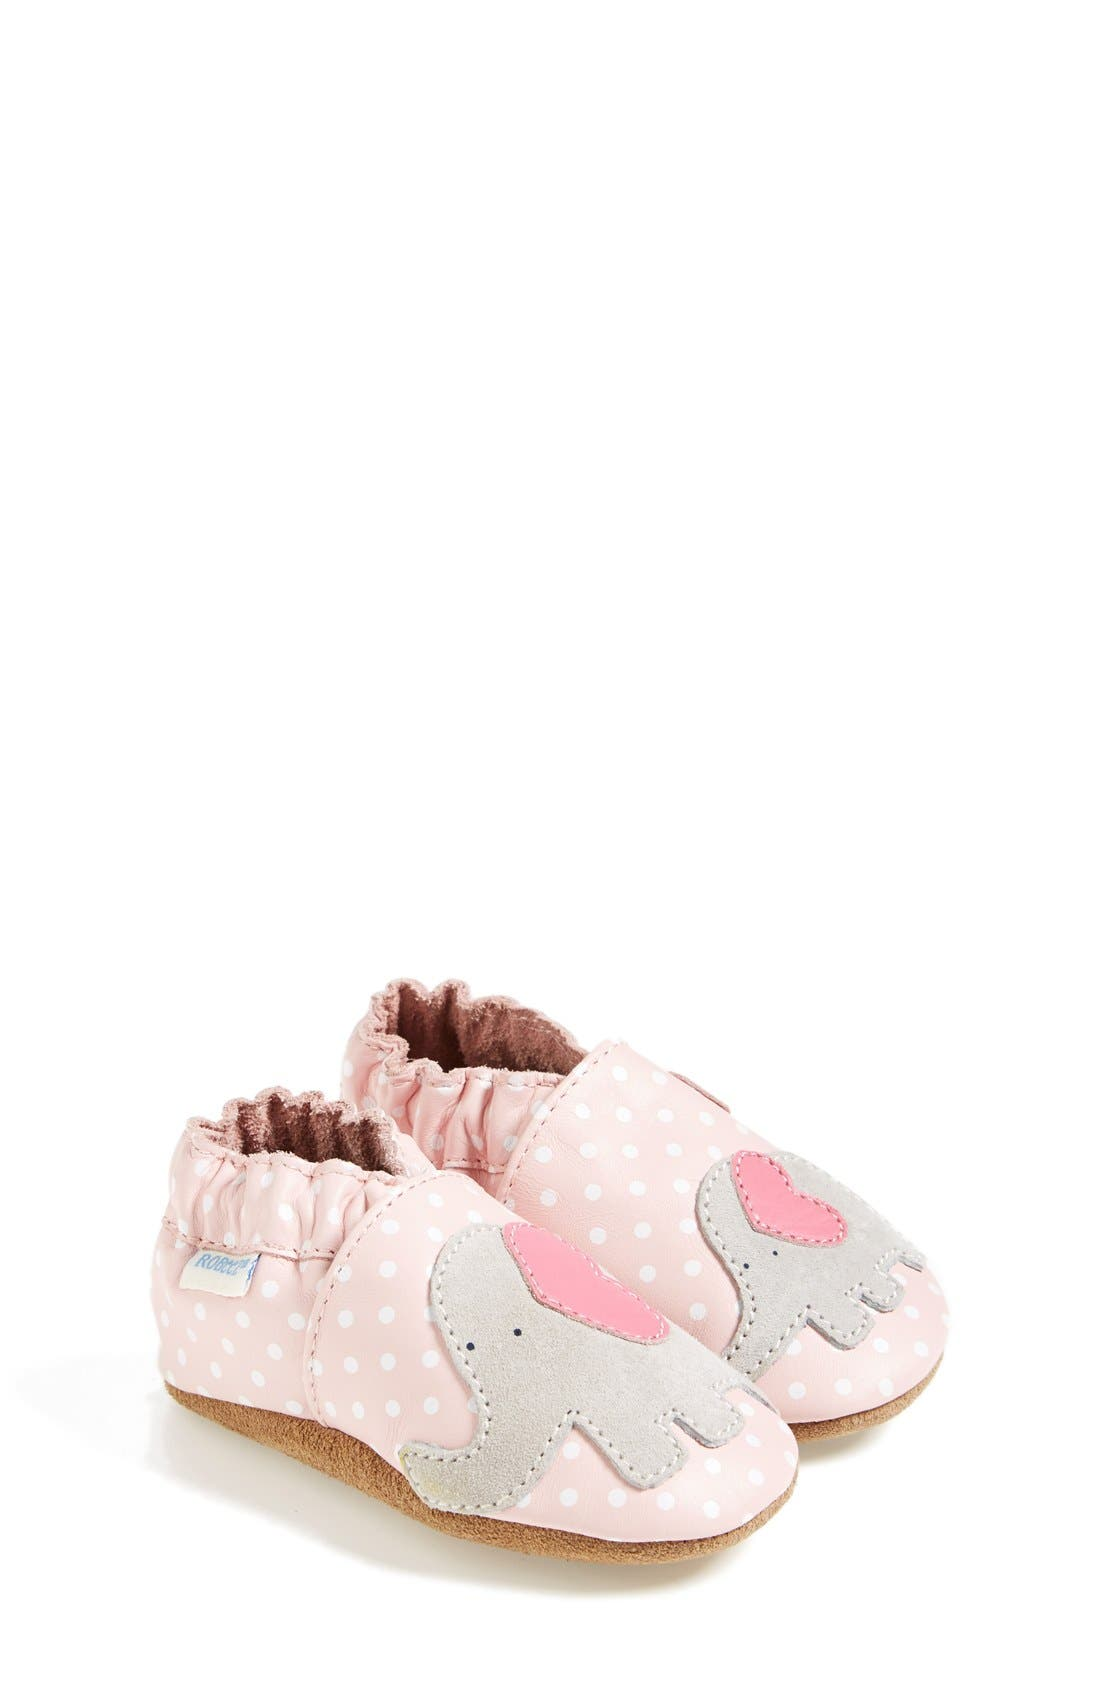 Alternate Image 1 Selected - Robeez® 'Little Peanut' Crib Shoe (Baby & Walker)